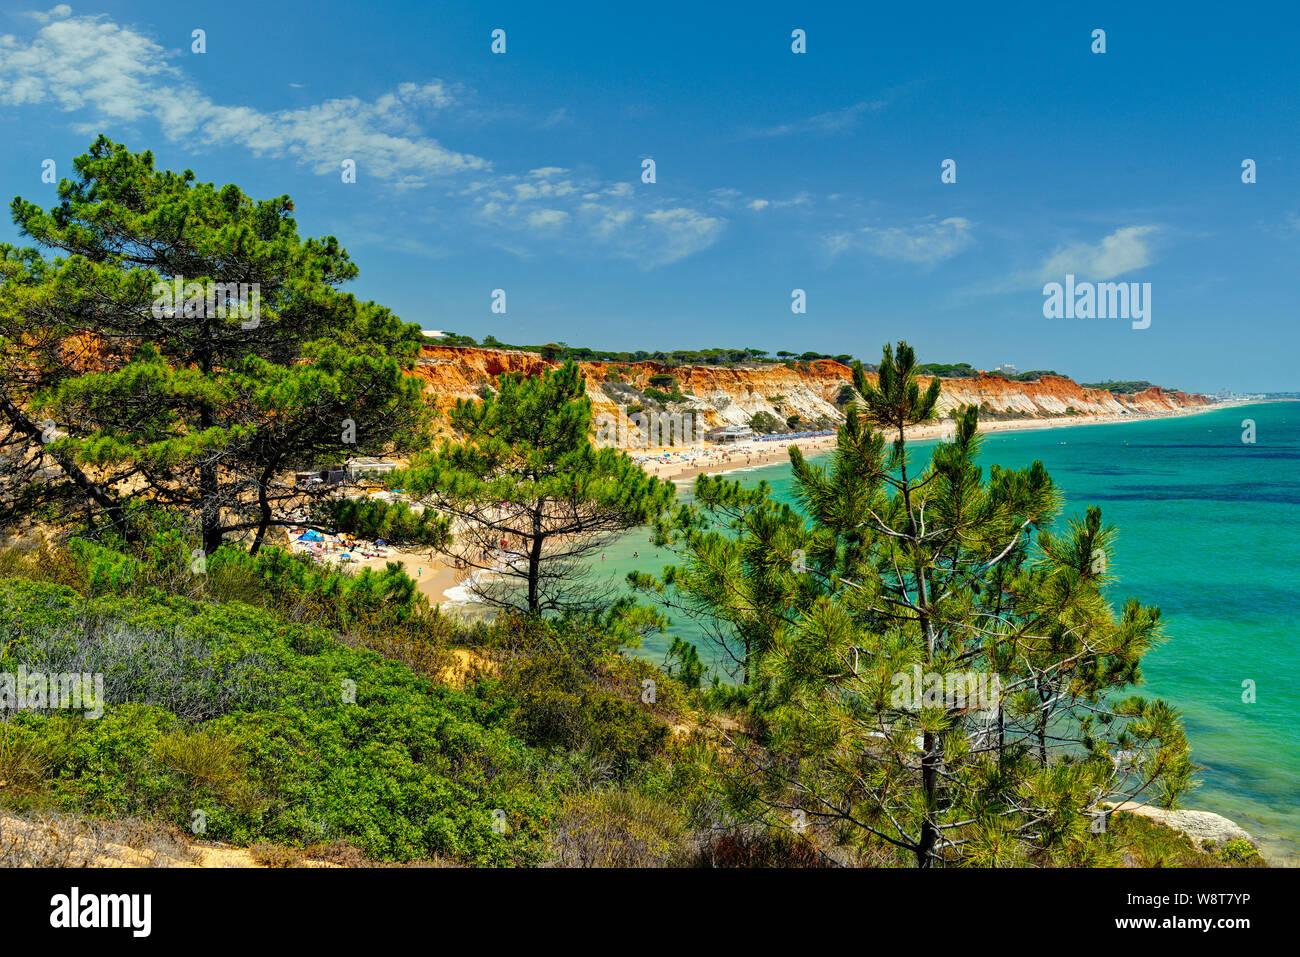 Praia da Falésia près de Albufeira, Algarve Banque D'Images